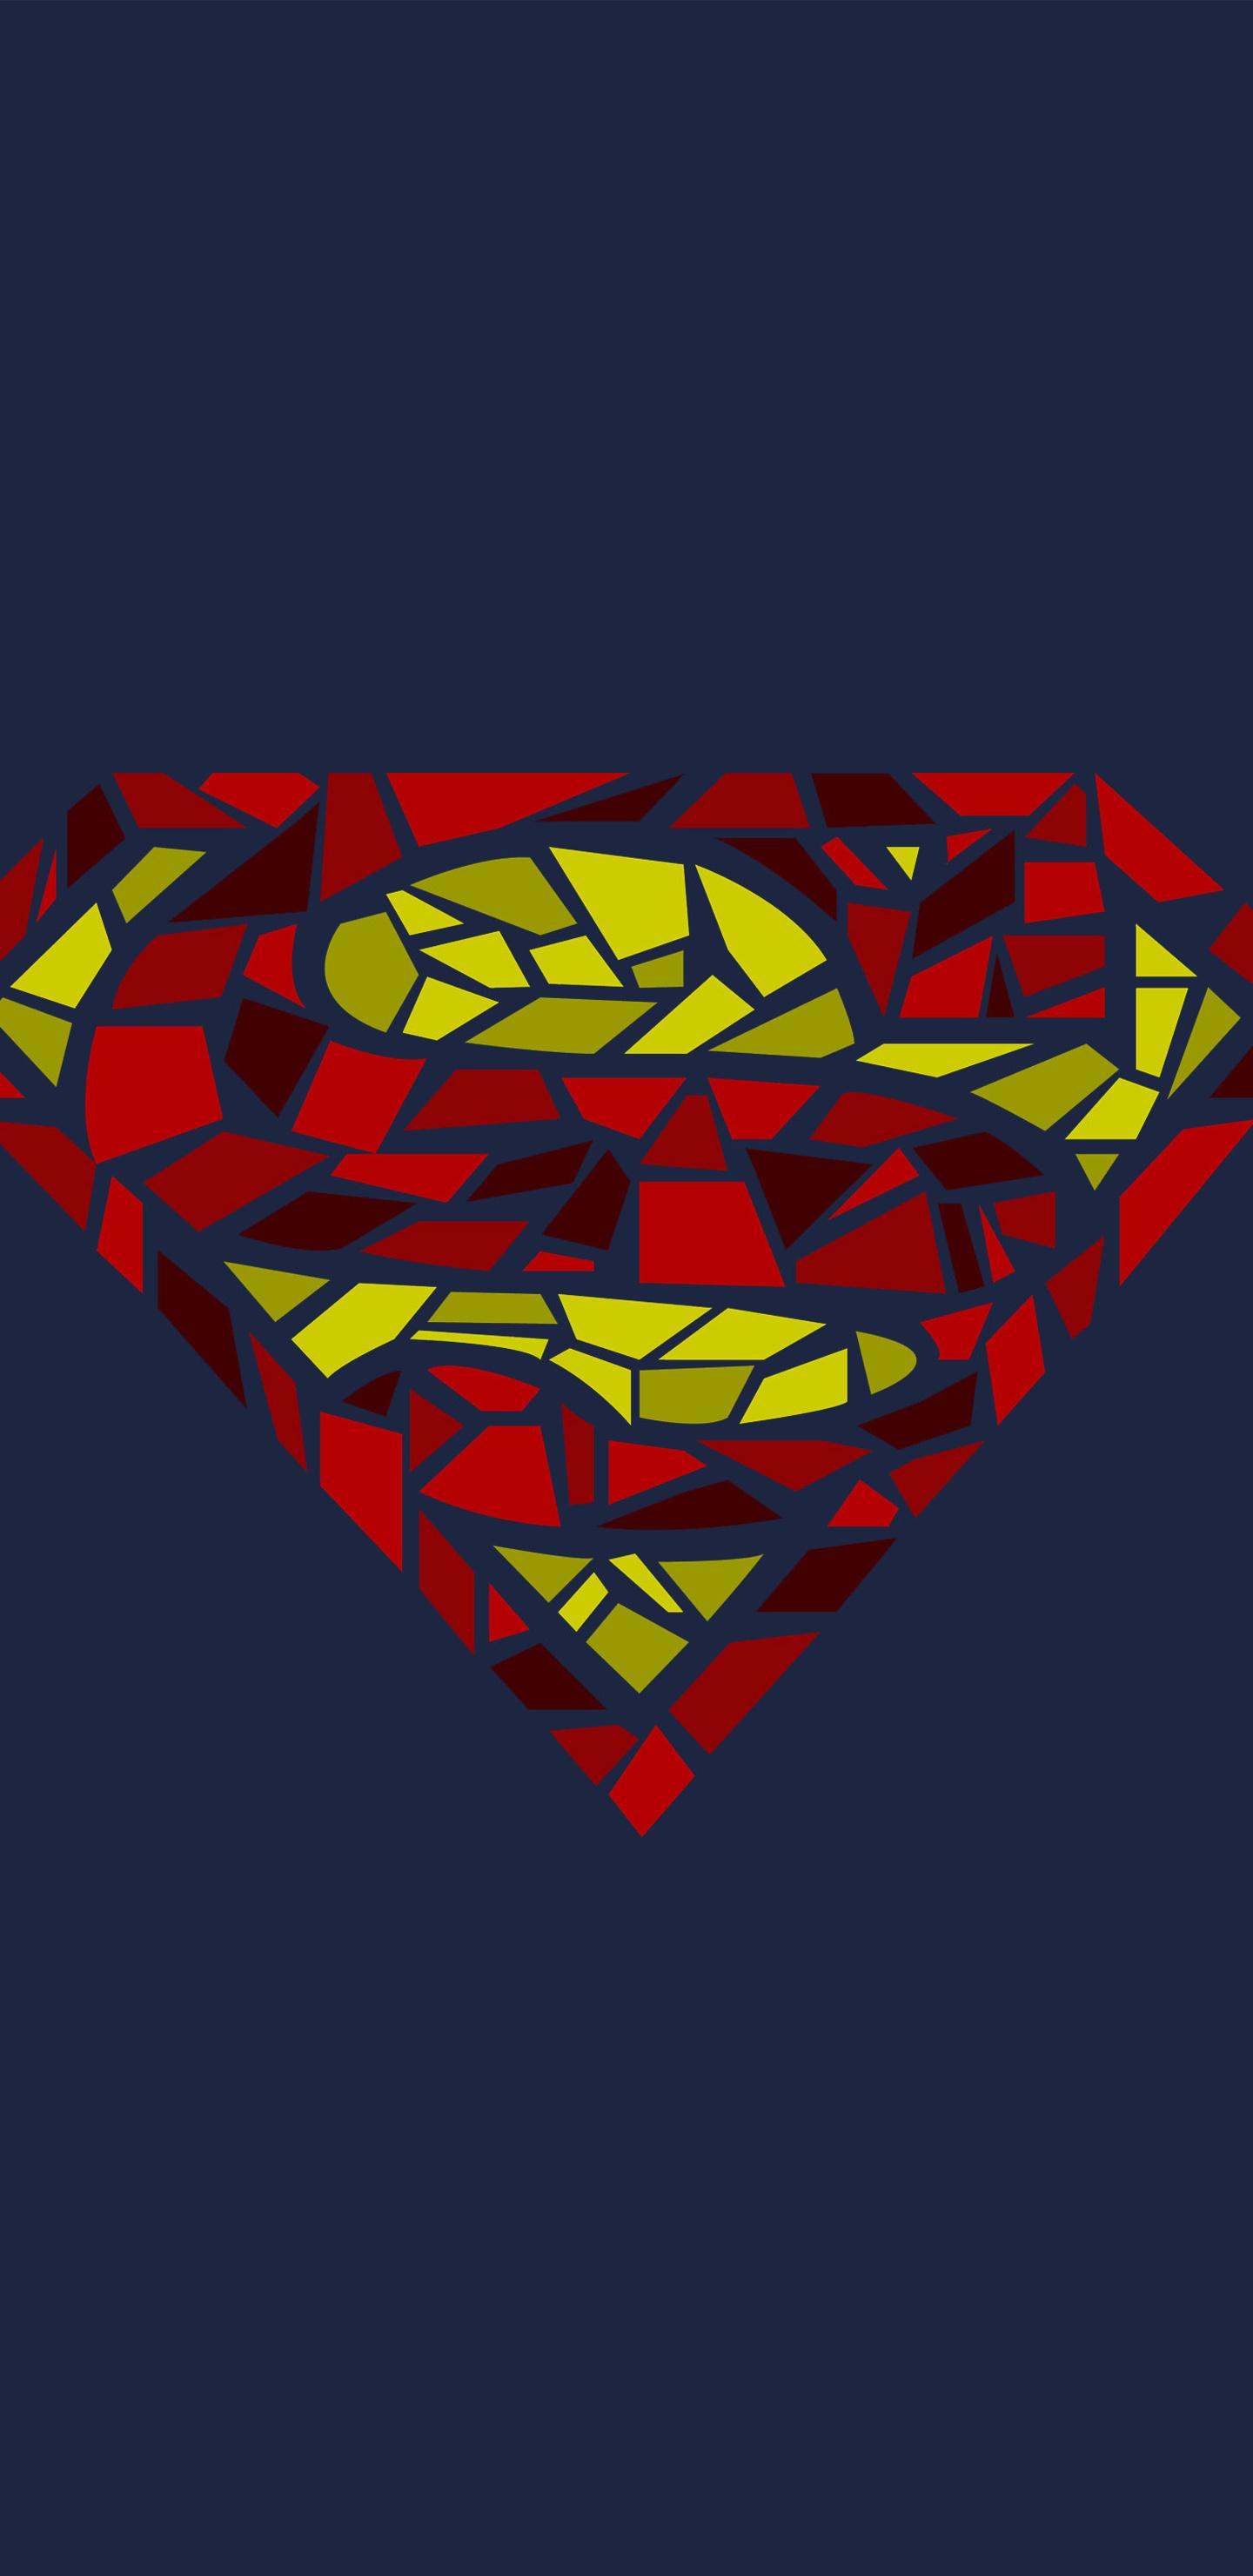 superman-logo-artwork-44.jpg